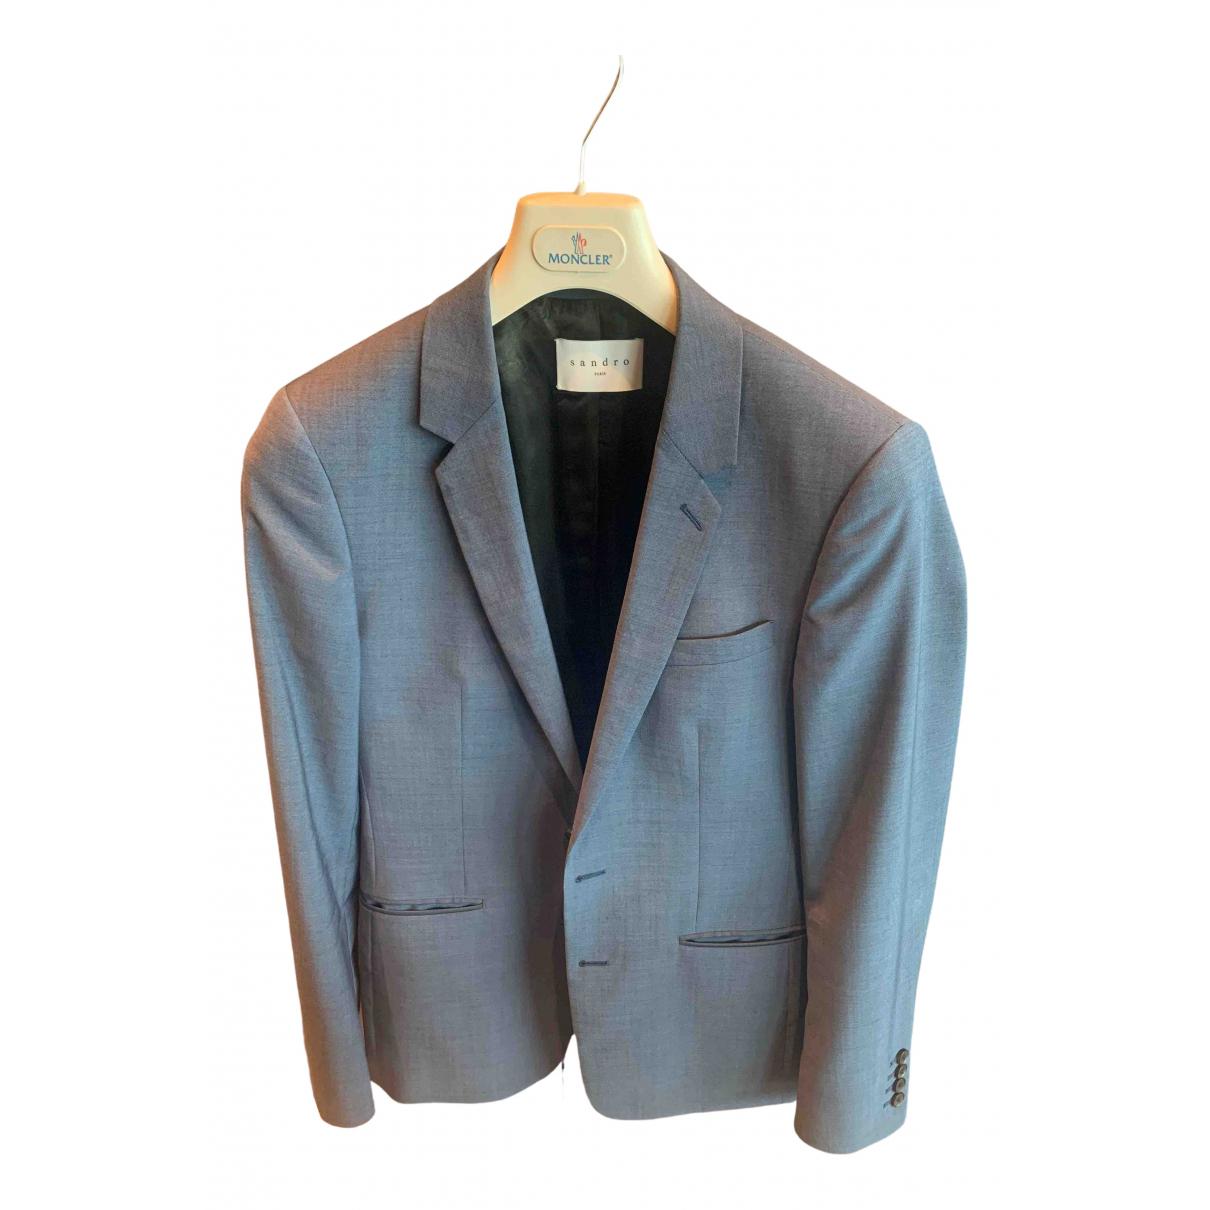 Sandro N Blue Wool Suits for Men 46 FR